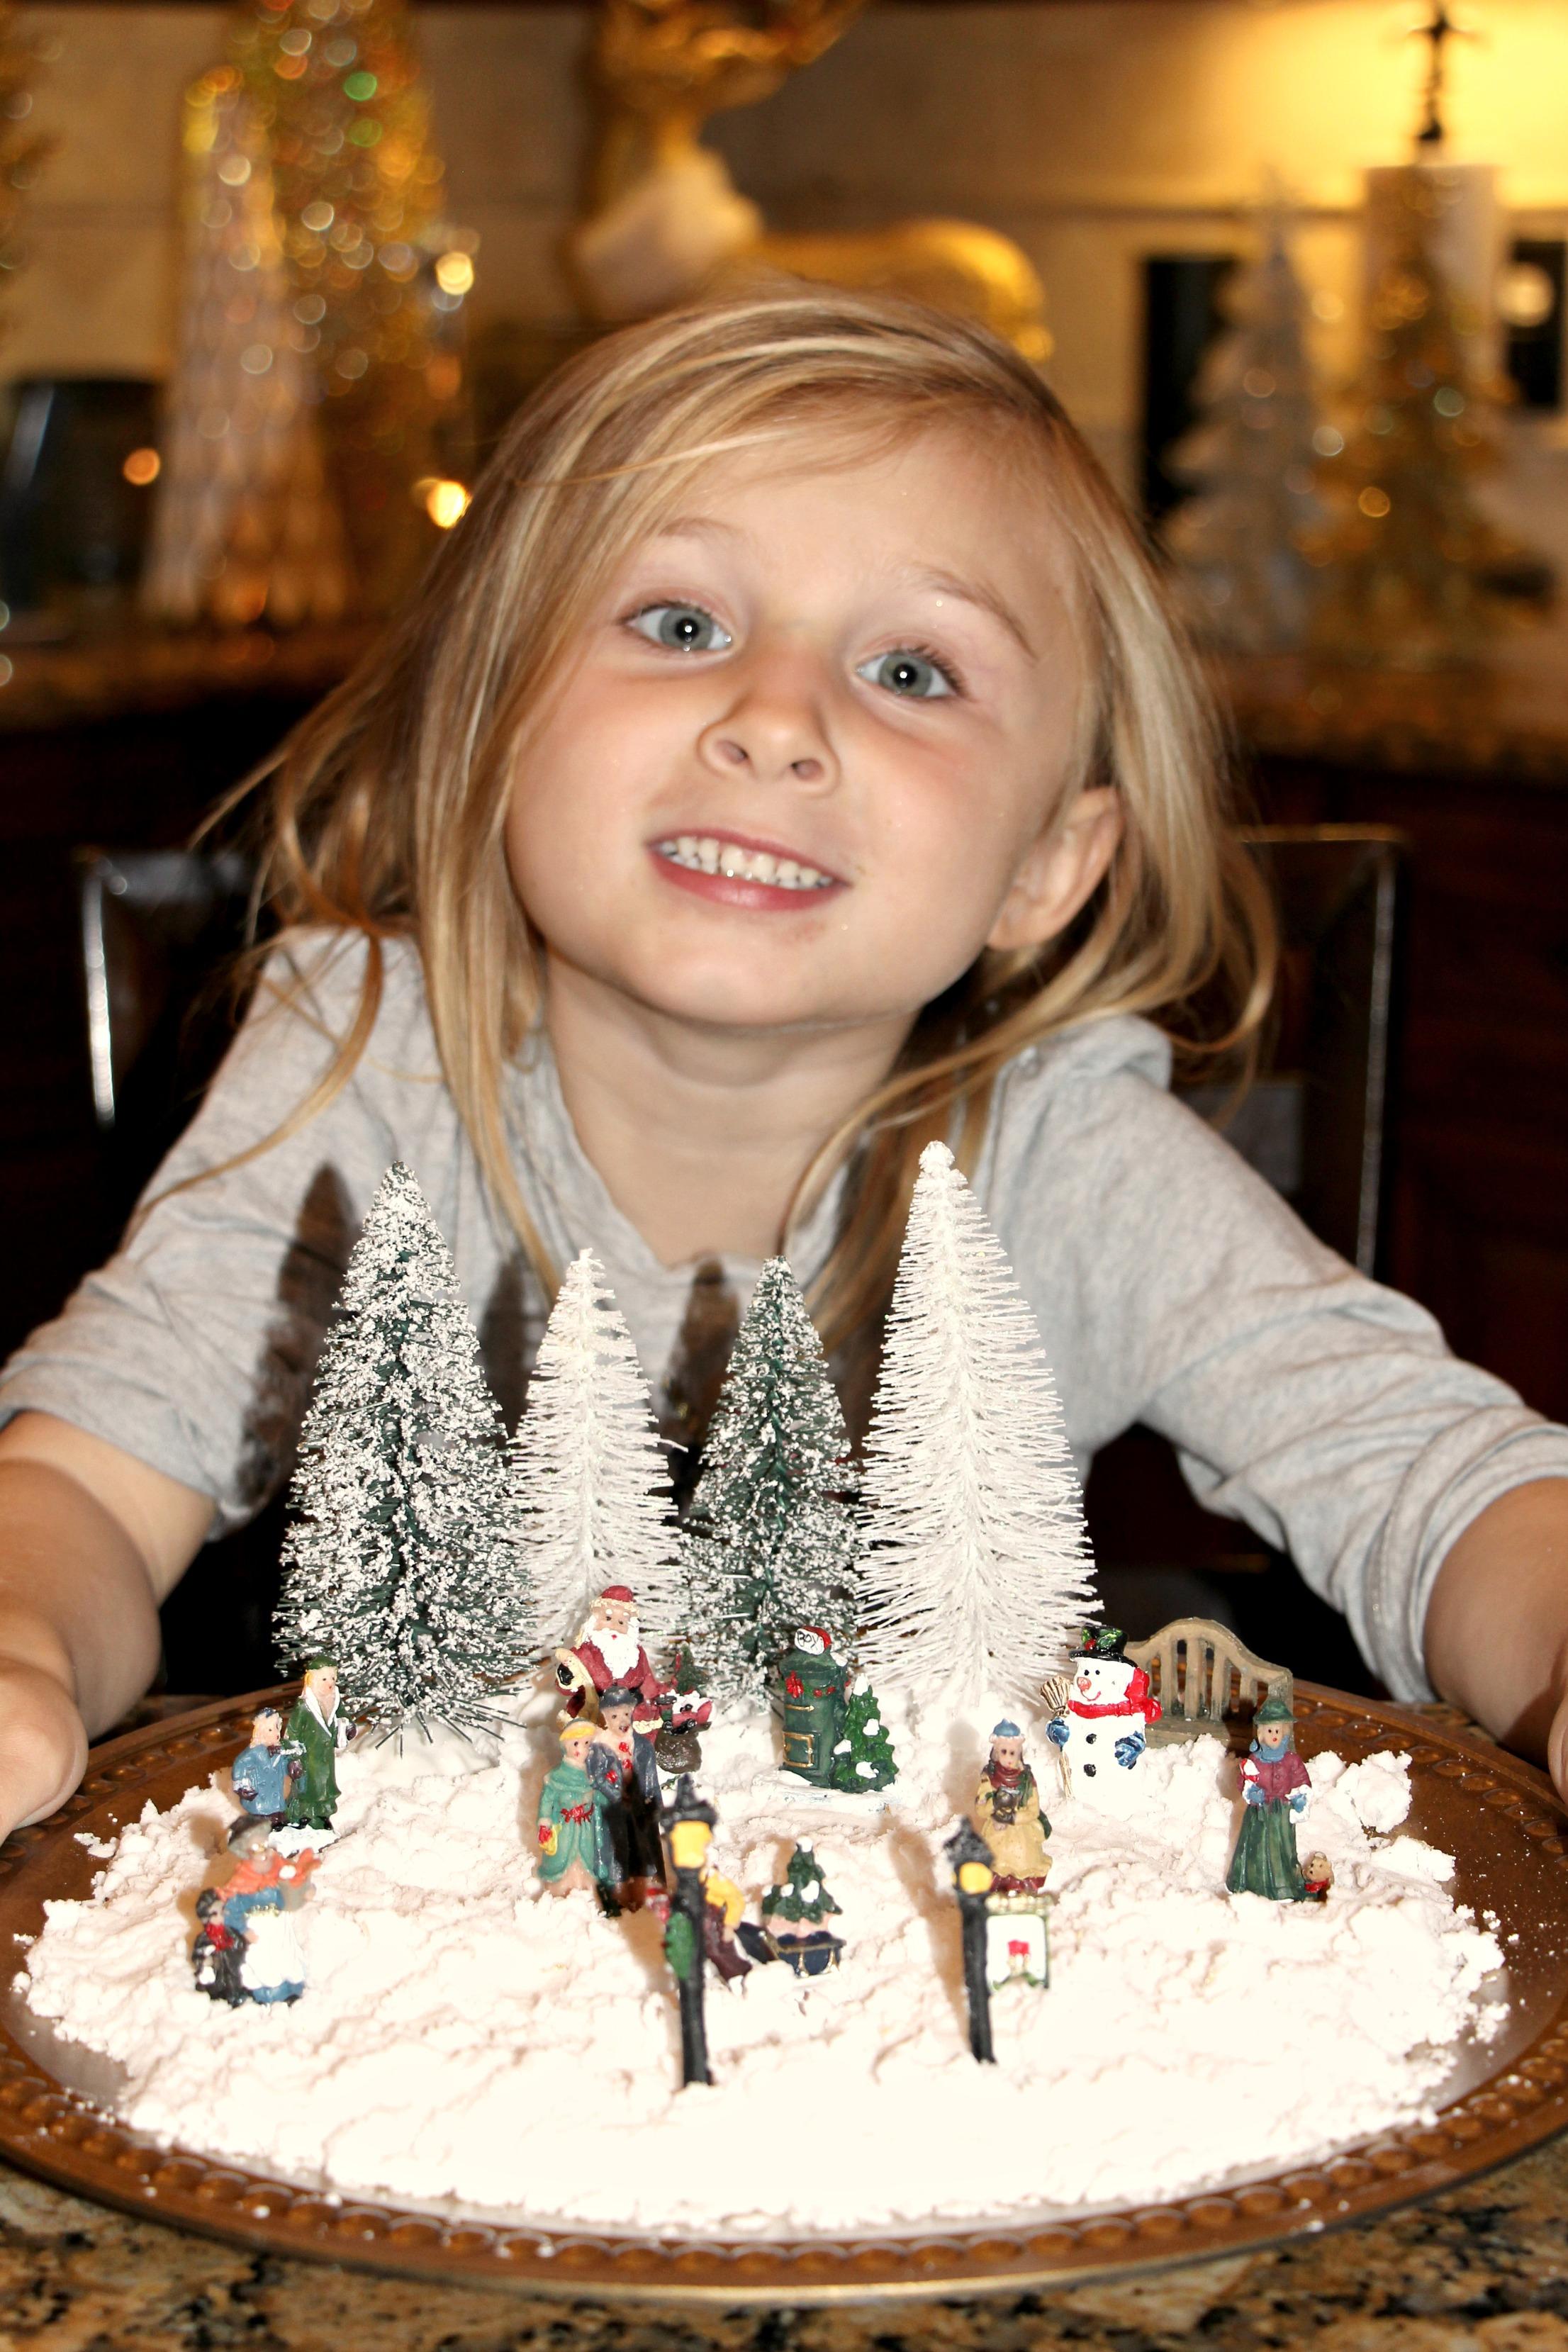 DIY Snow & Winter Wonderland: Sensory Play